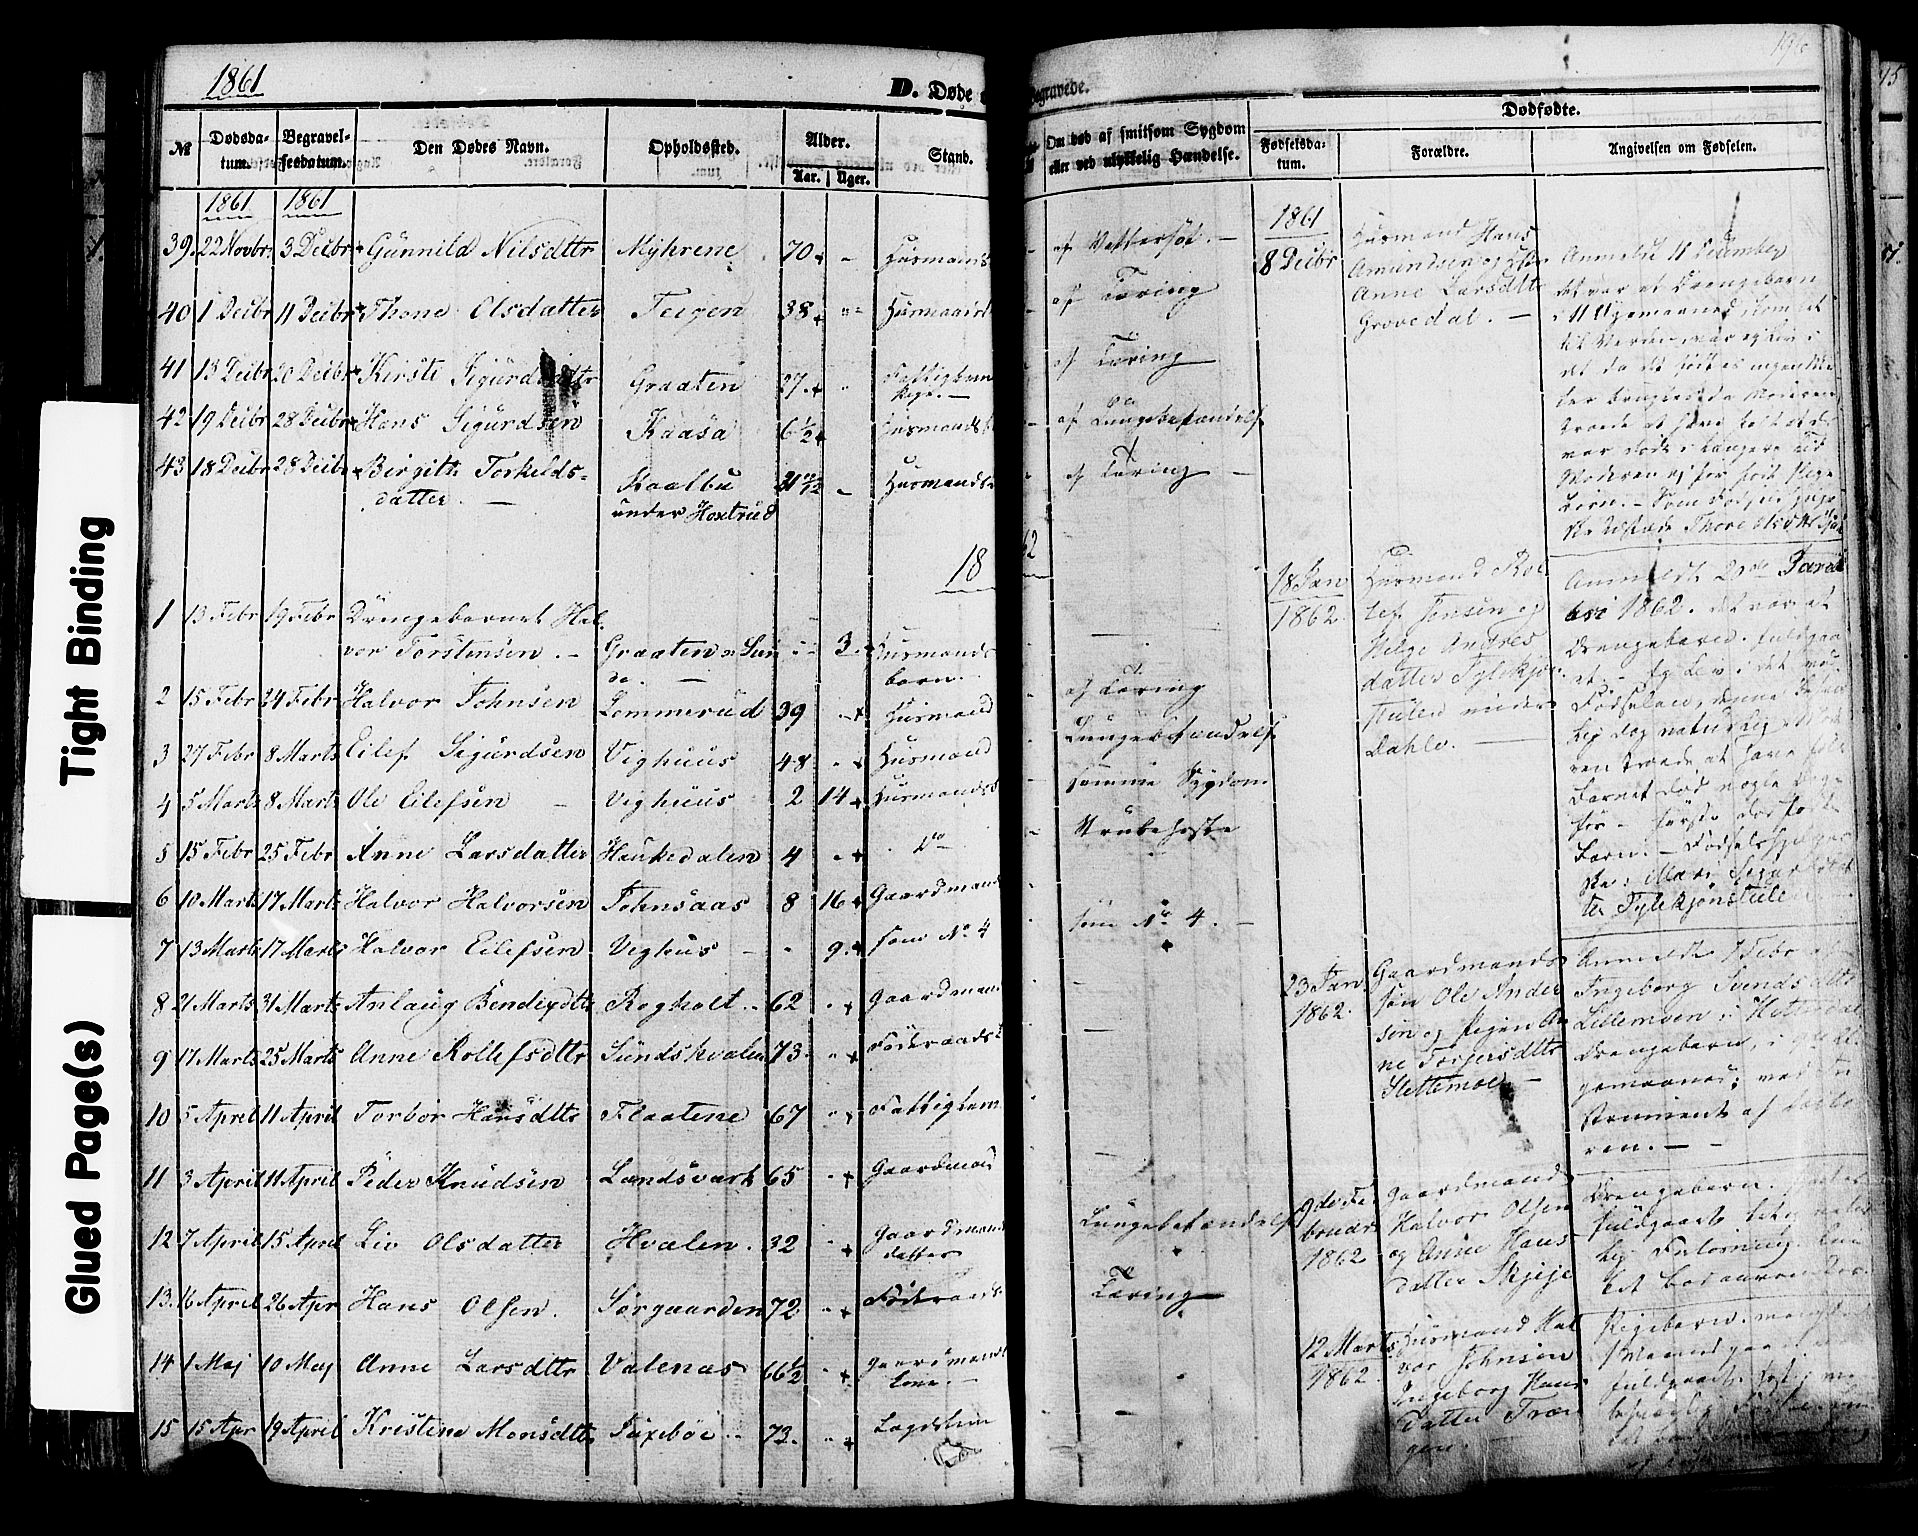 SAKO, Sauherad kirkebøker, F/Fa/L0007: Ministerialbok nr. I 7, 1851-1873, s. 196